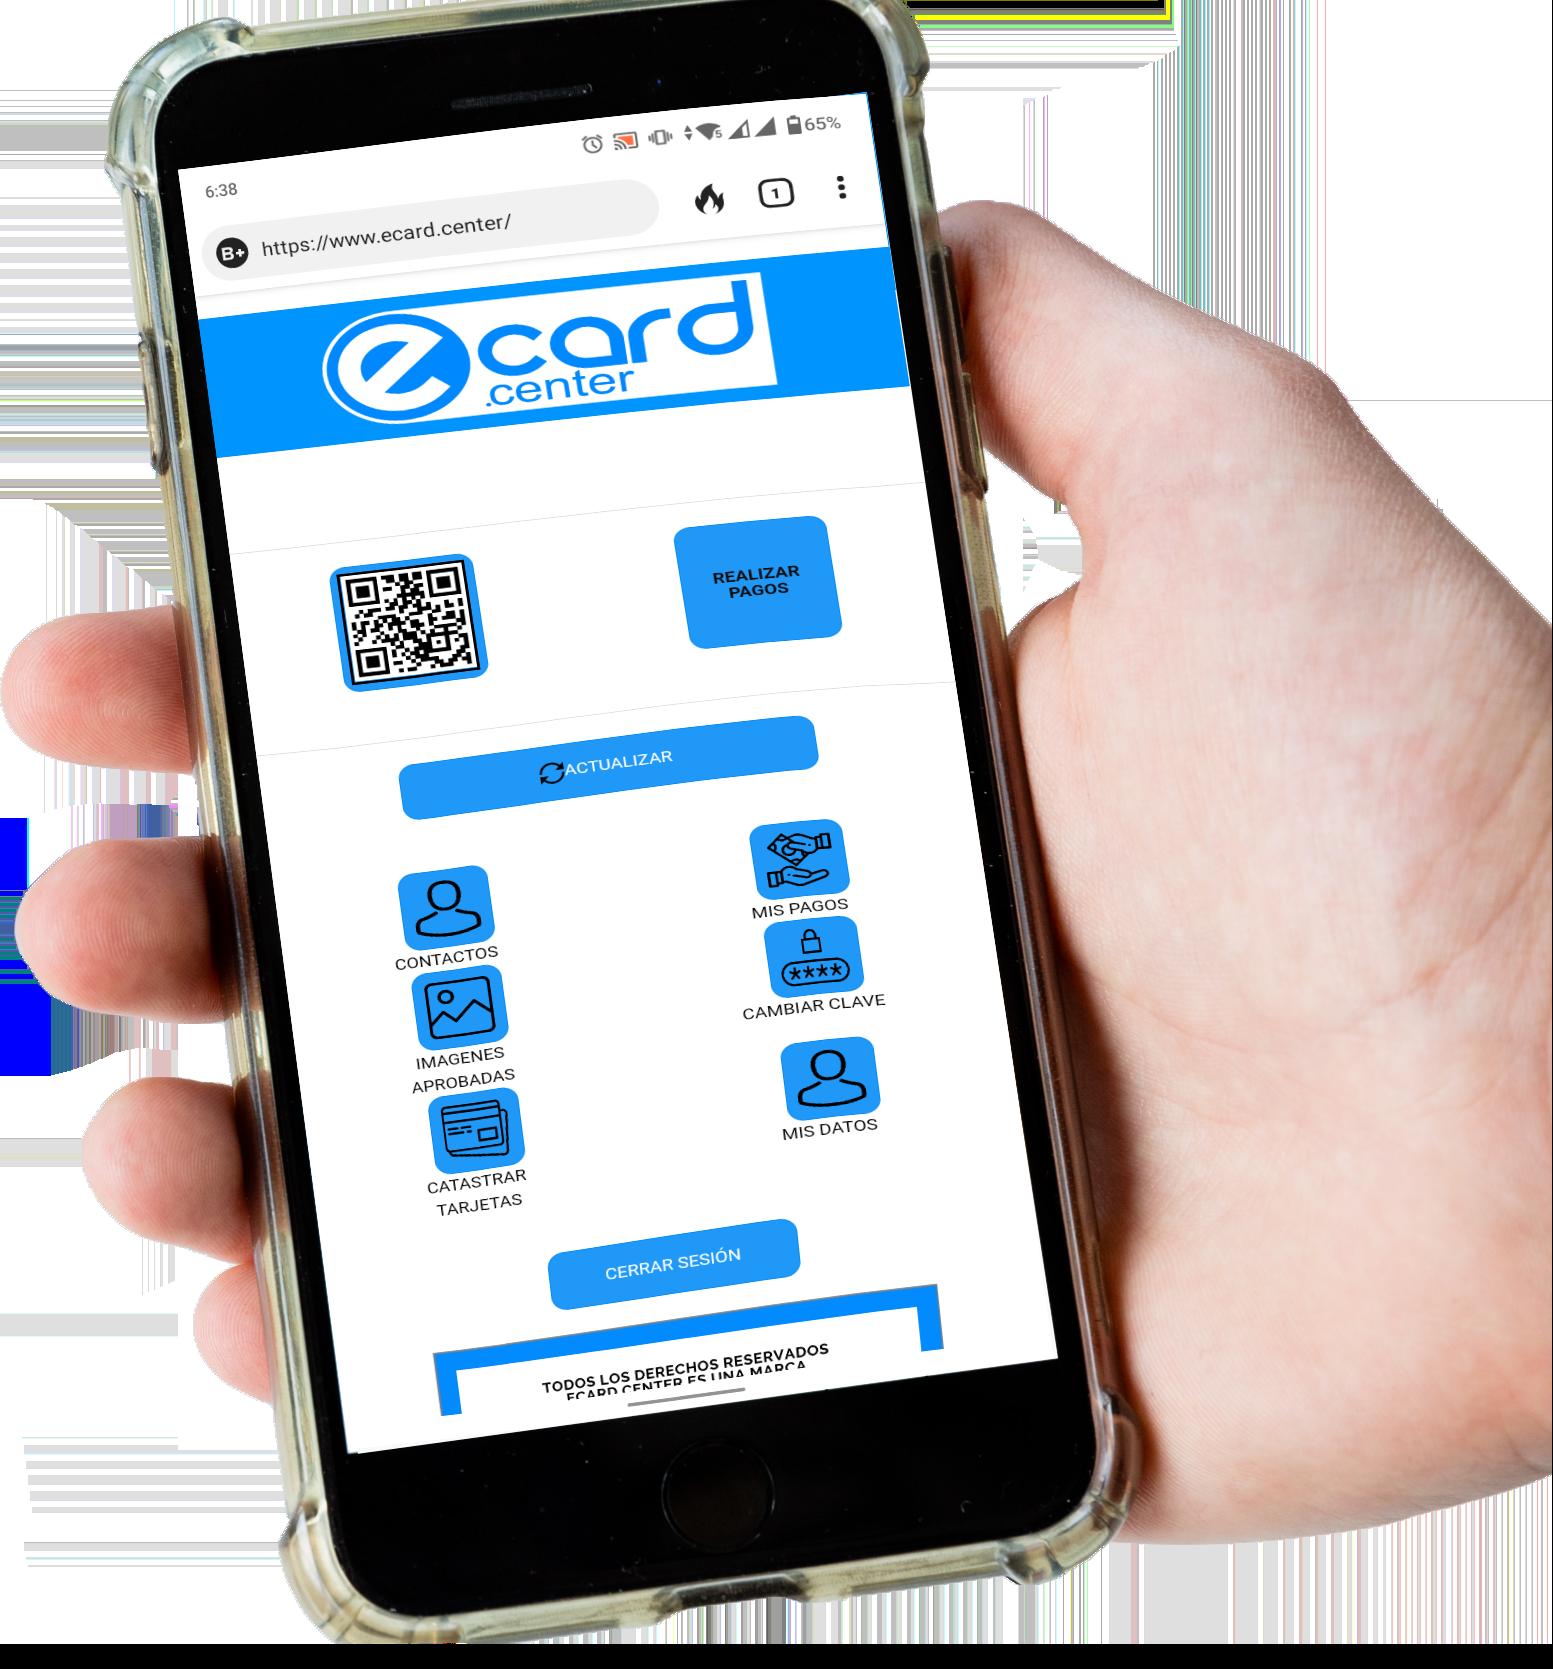 ecard phone hand